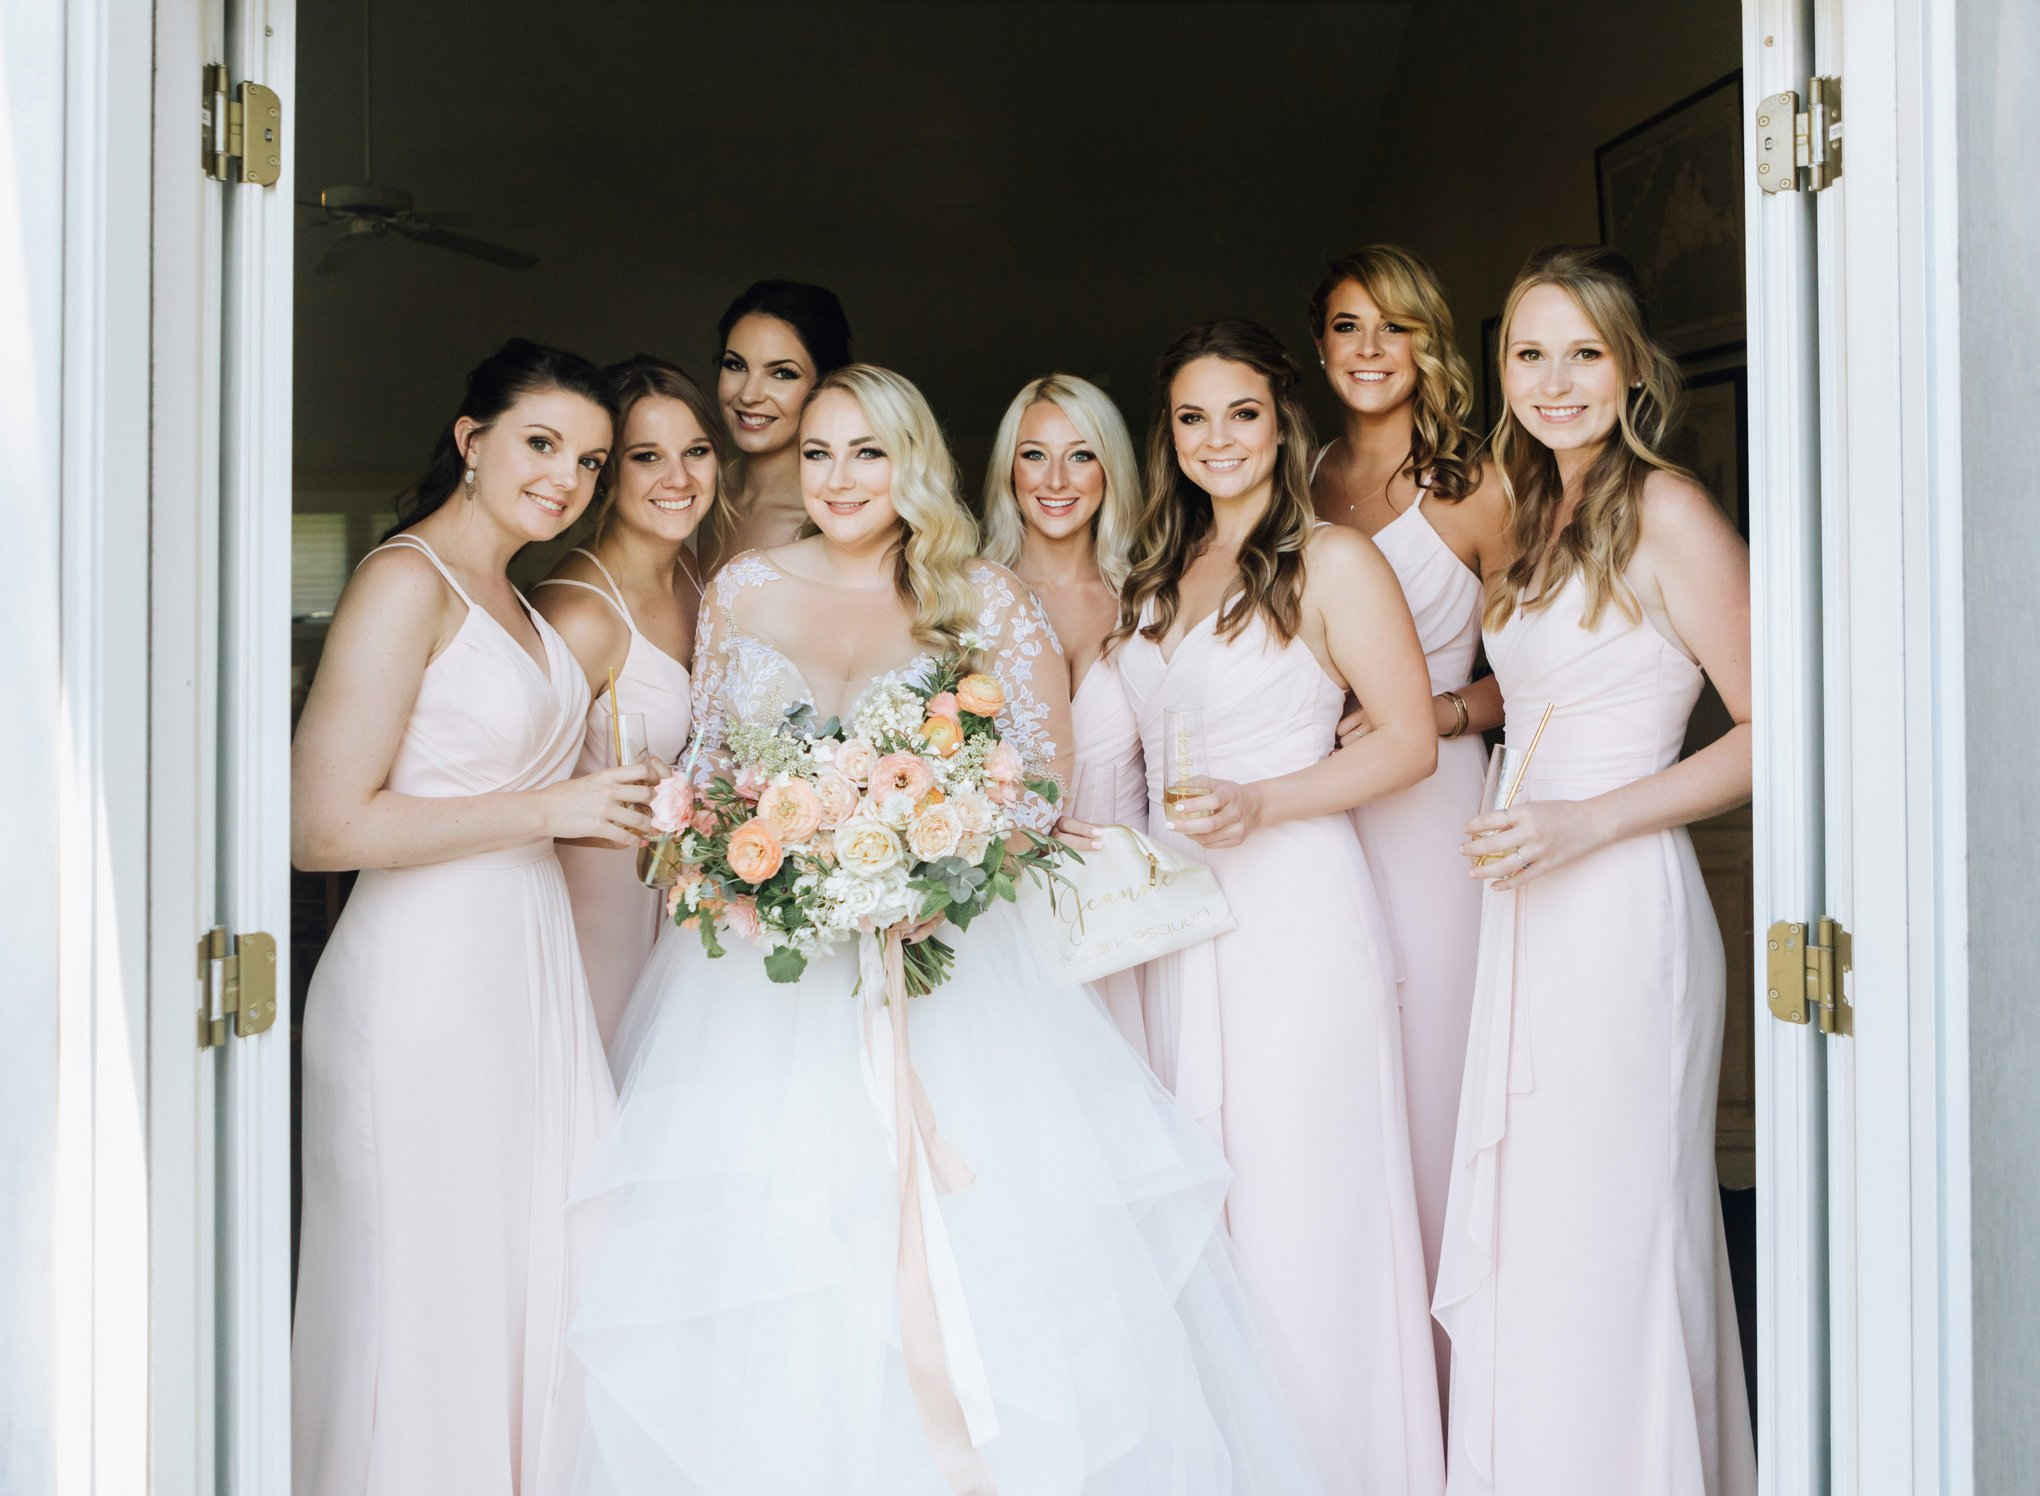 Marthas-Vineyard-Wedding-Photographer-Beach-Plum-Inn-8.jpg